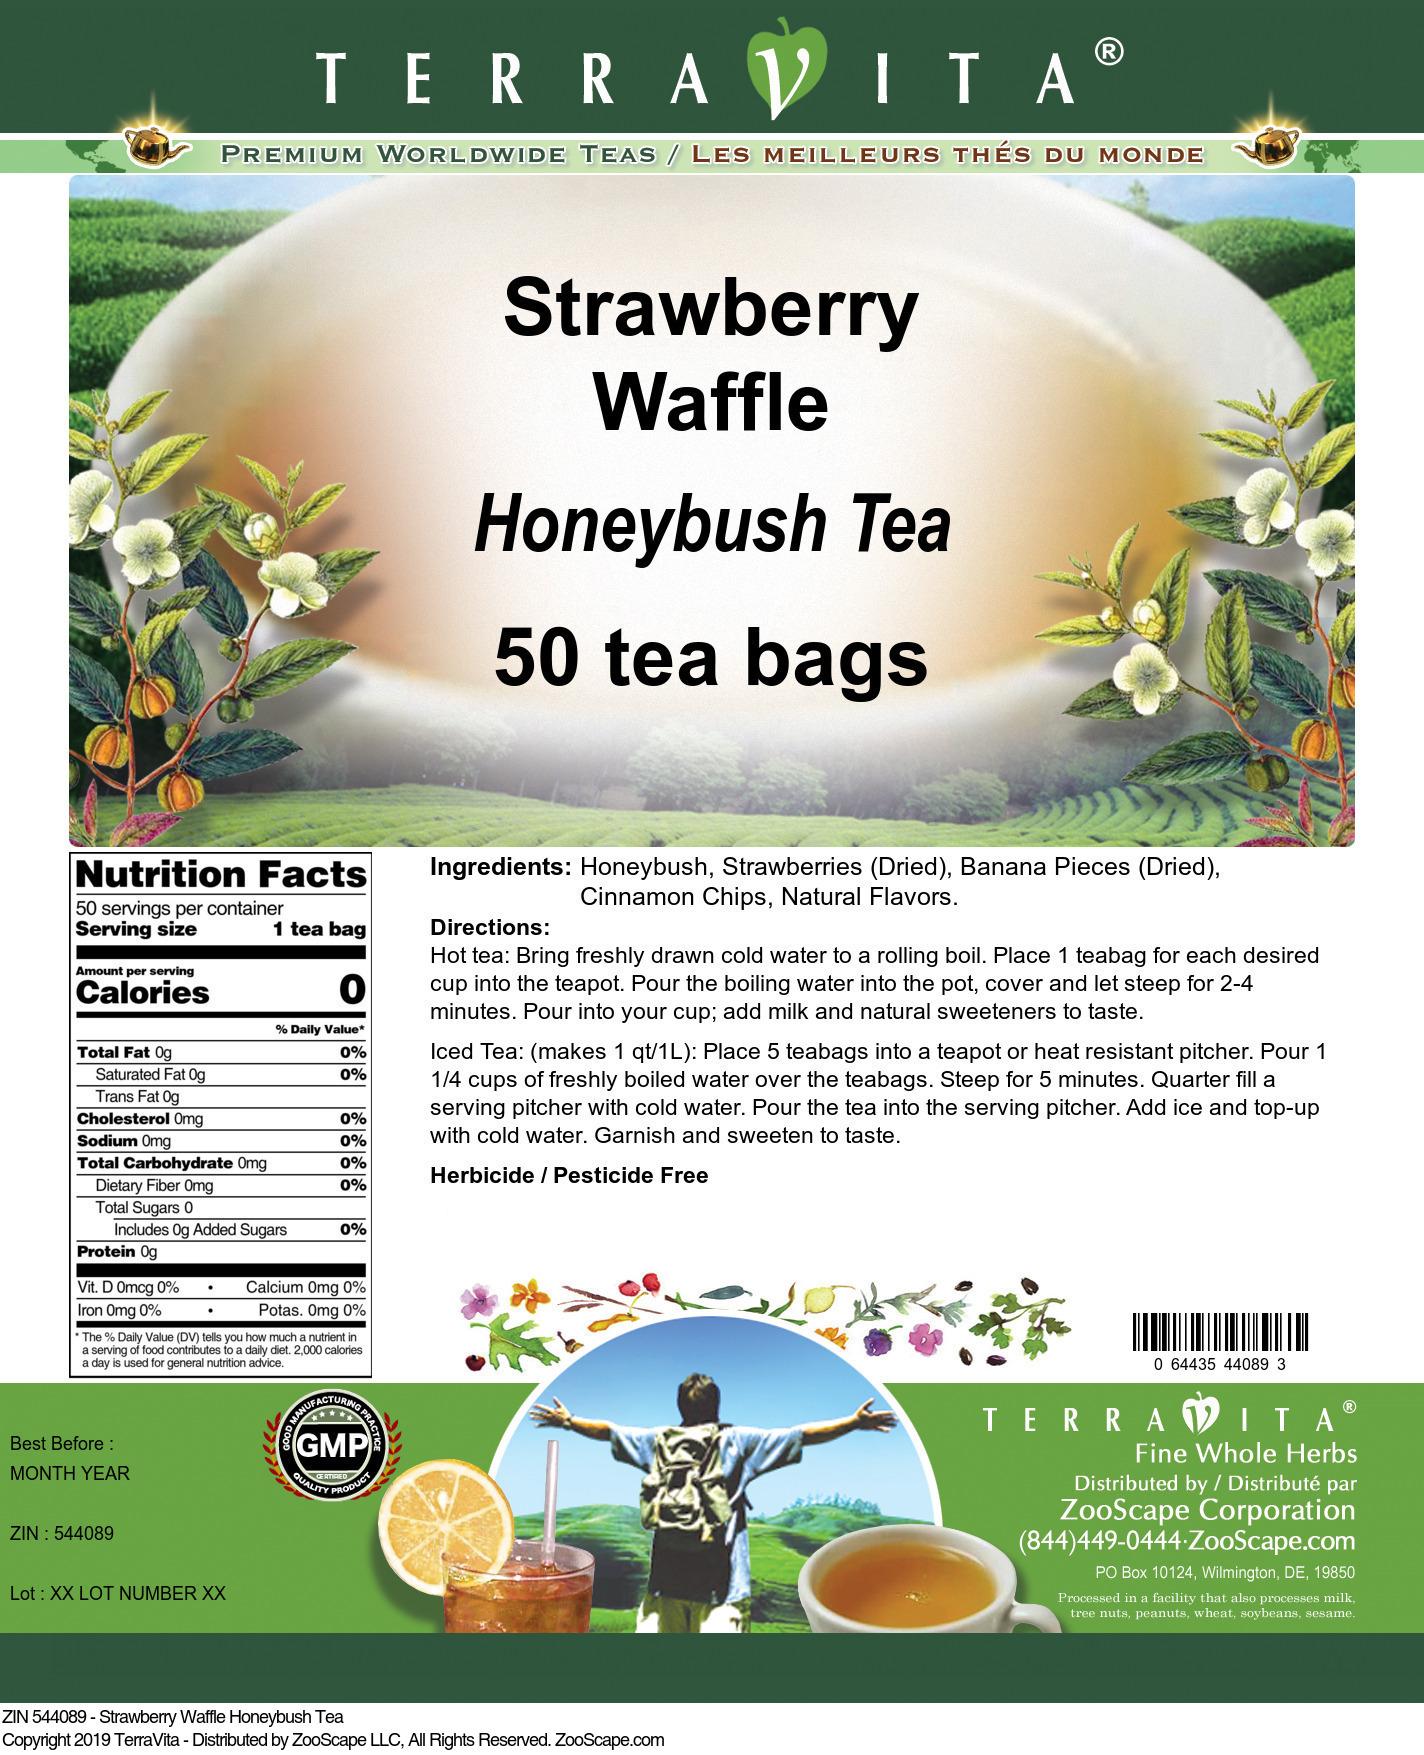 Strawberry Waffle Honeybush Tea